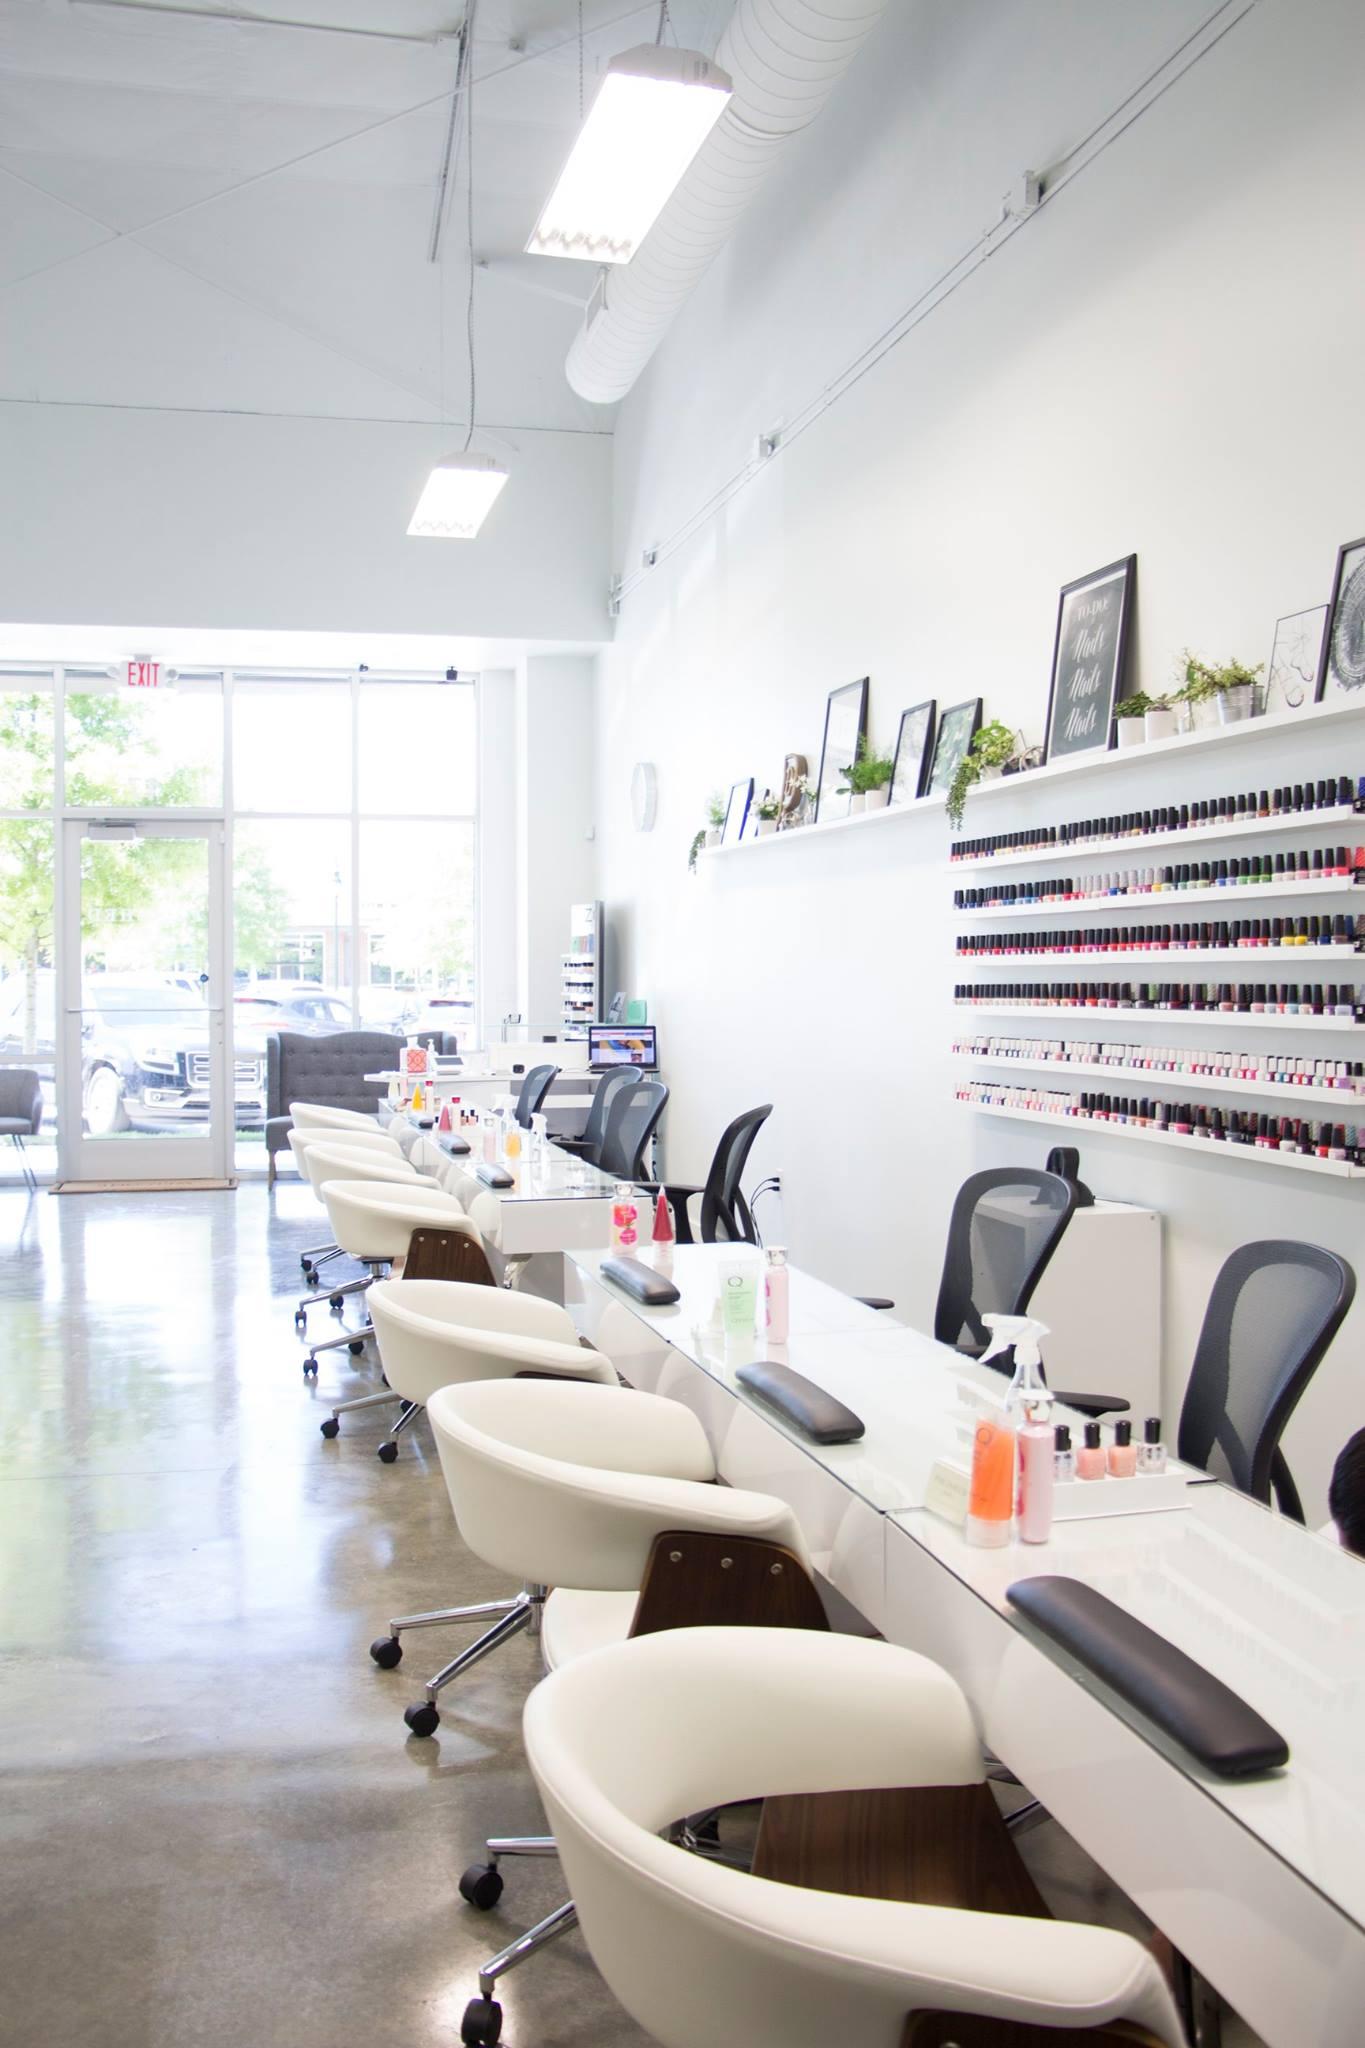 Jackson Nails - Jackson, Tennessee - Nail salon | Facebook